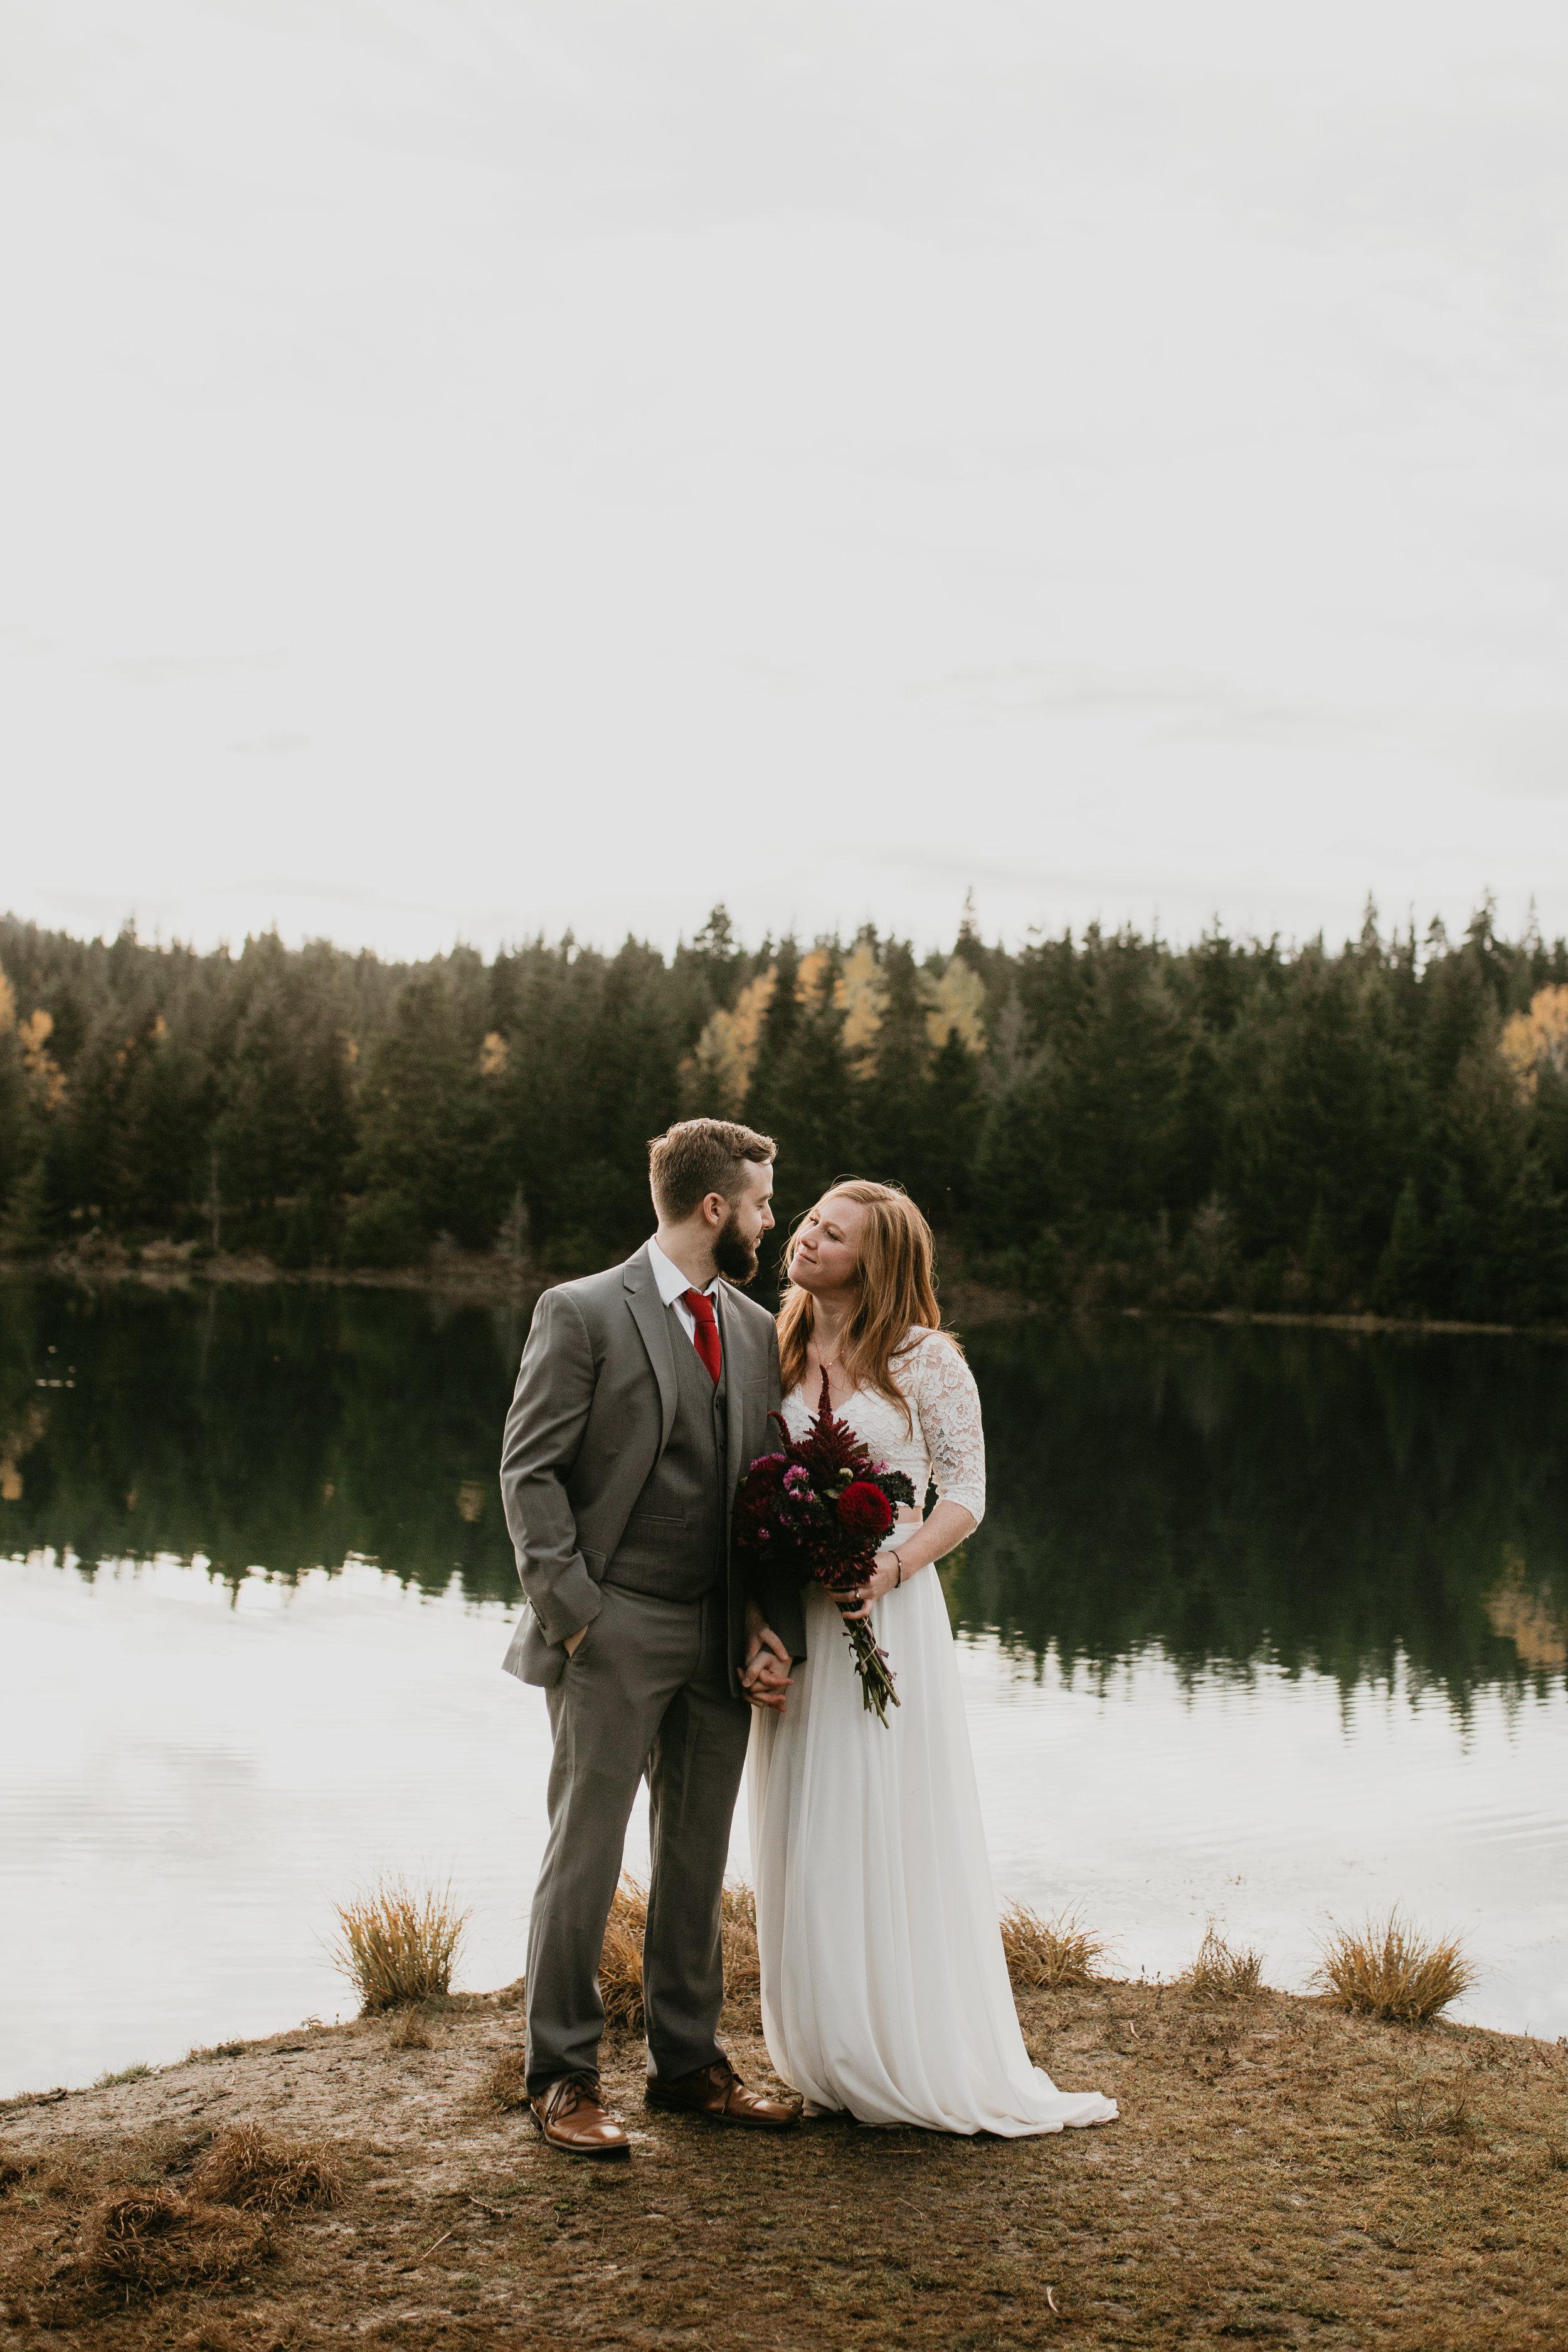 nicole-daacke-photography-mountain-view-elopement-at-gold-creek-pond-snoqualmie-washington-wa-elopement-photographer-photography-adventure-elopement-in-washington-fall-lakeside-golden-sunset-boho-fun-bride-0478.jpg